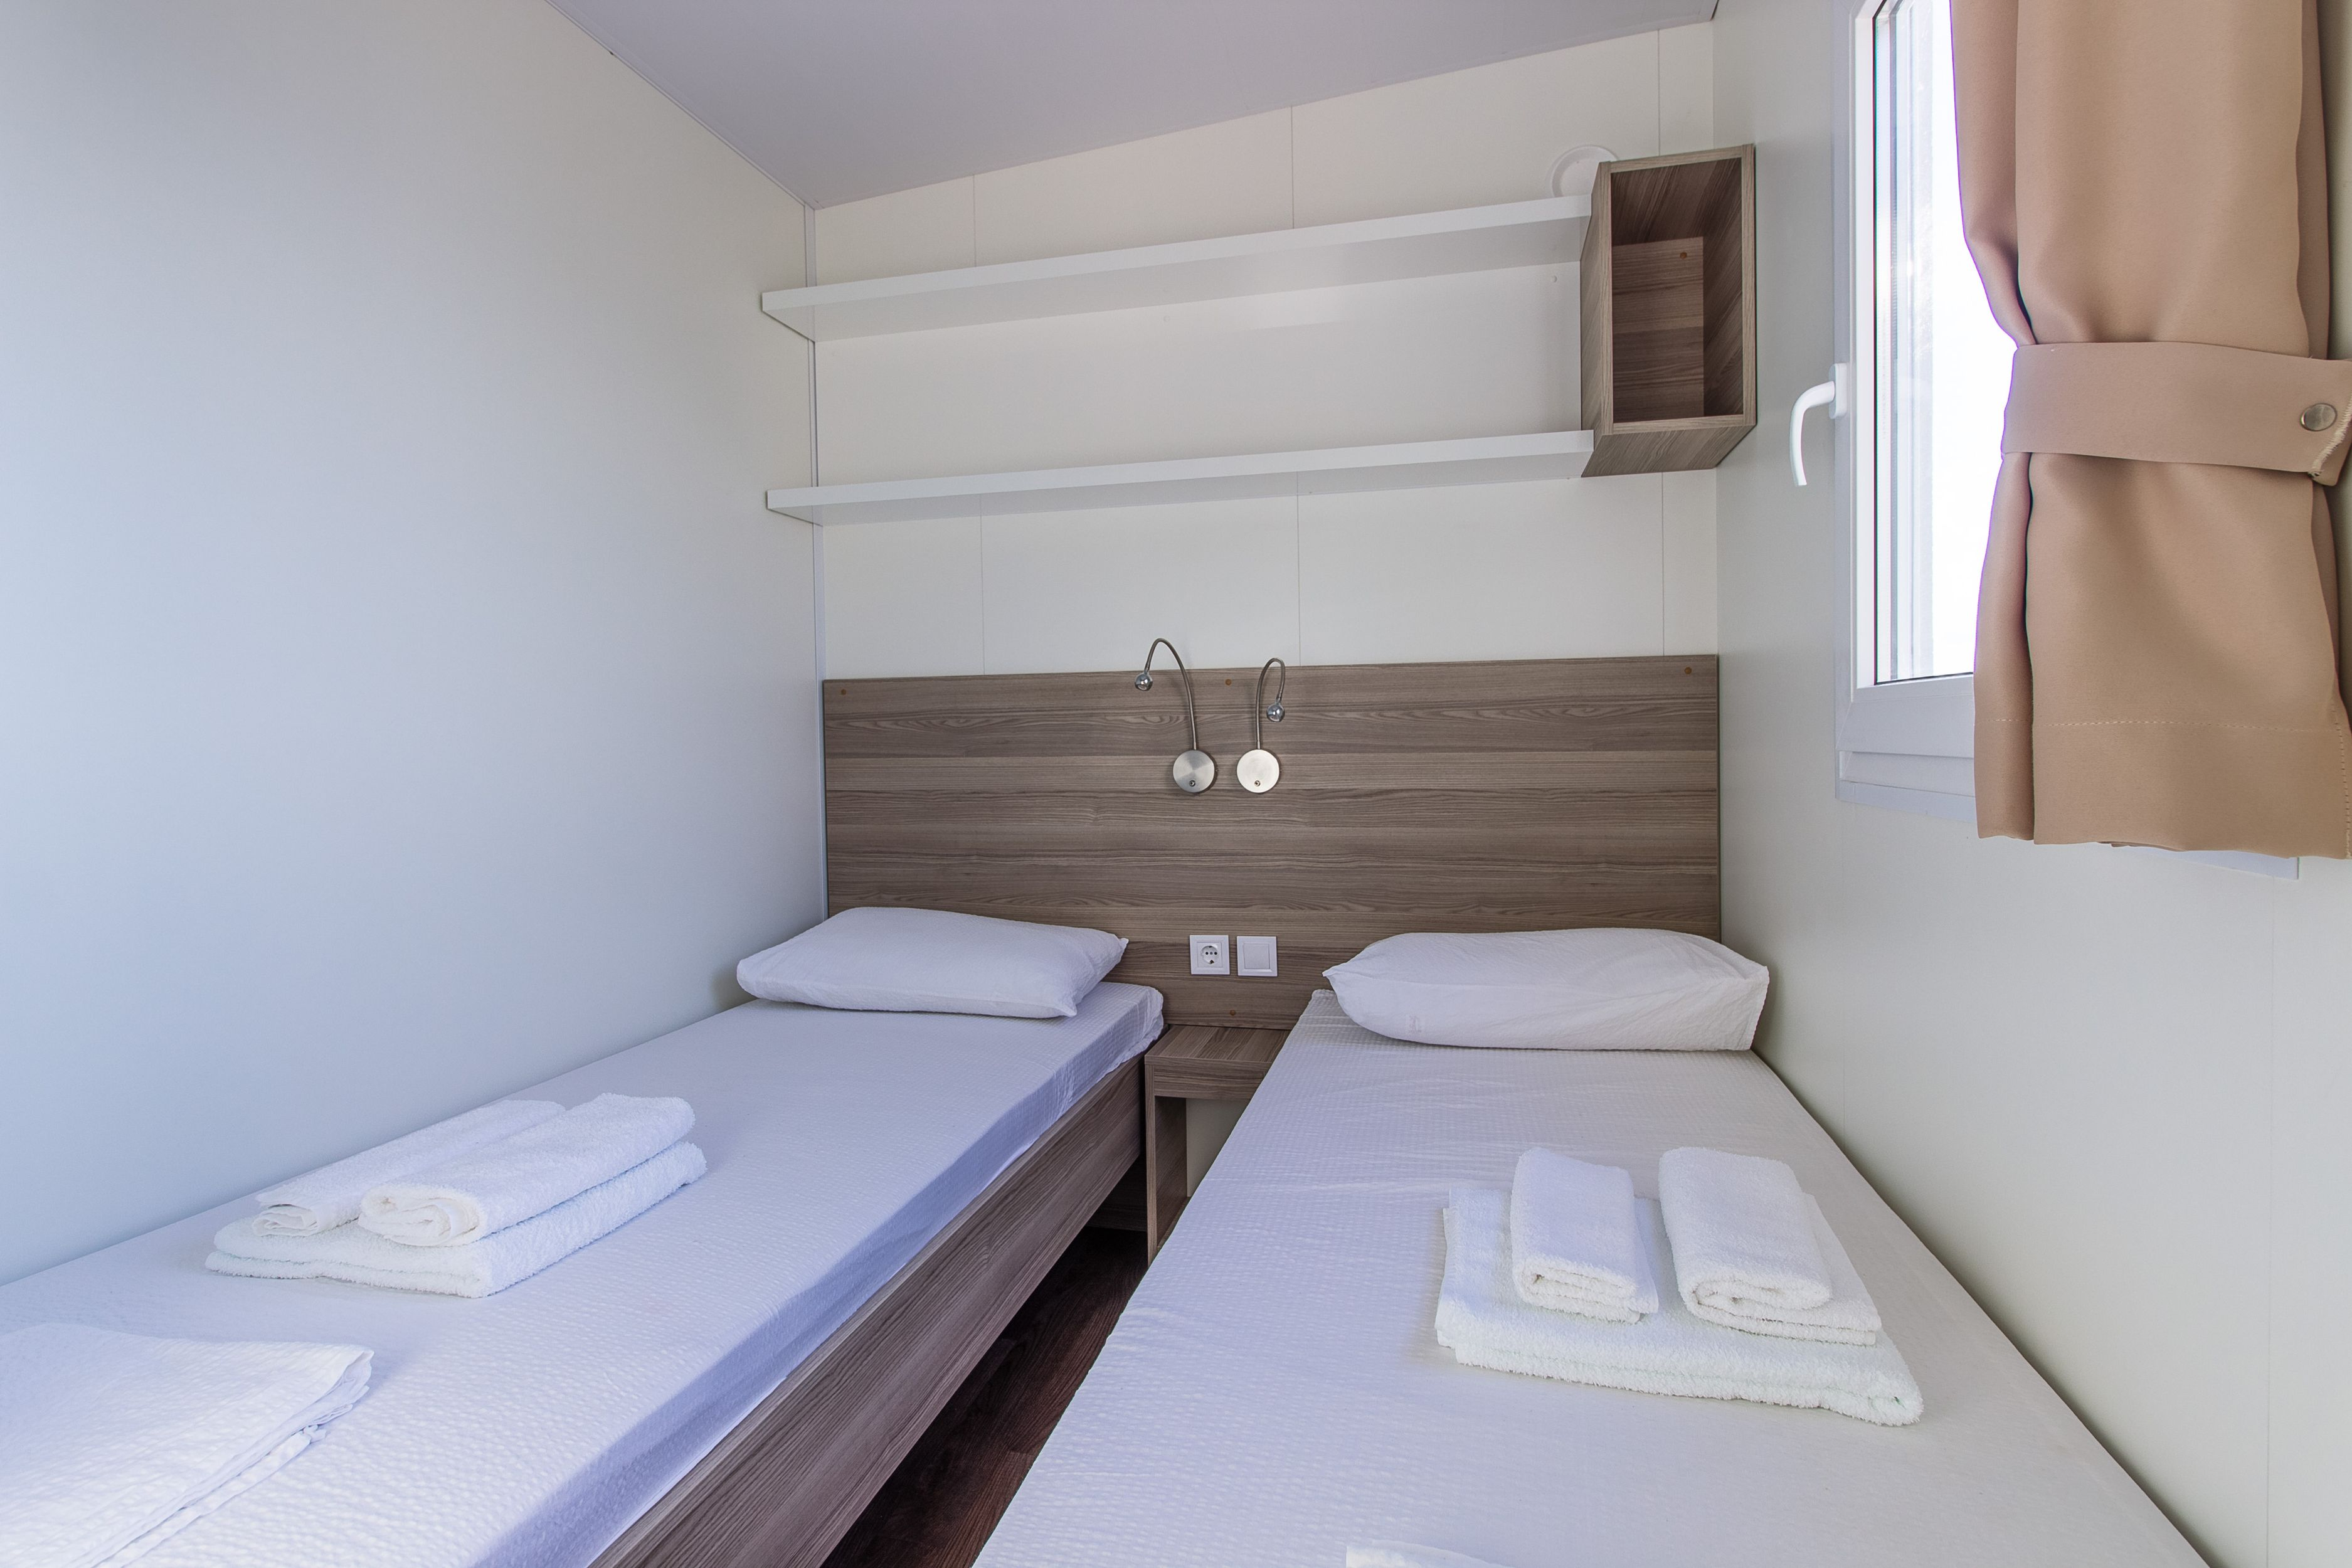 Glampingunterkunft: Mobilheim Mediterran Comfort Family Mit Meerblick Von  Mediteran Kamp Auf Camping Klenovica